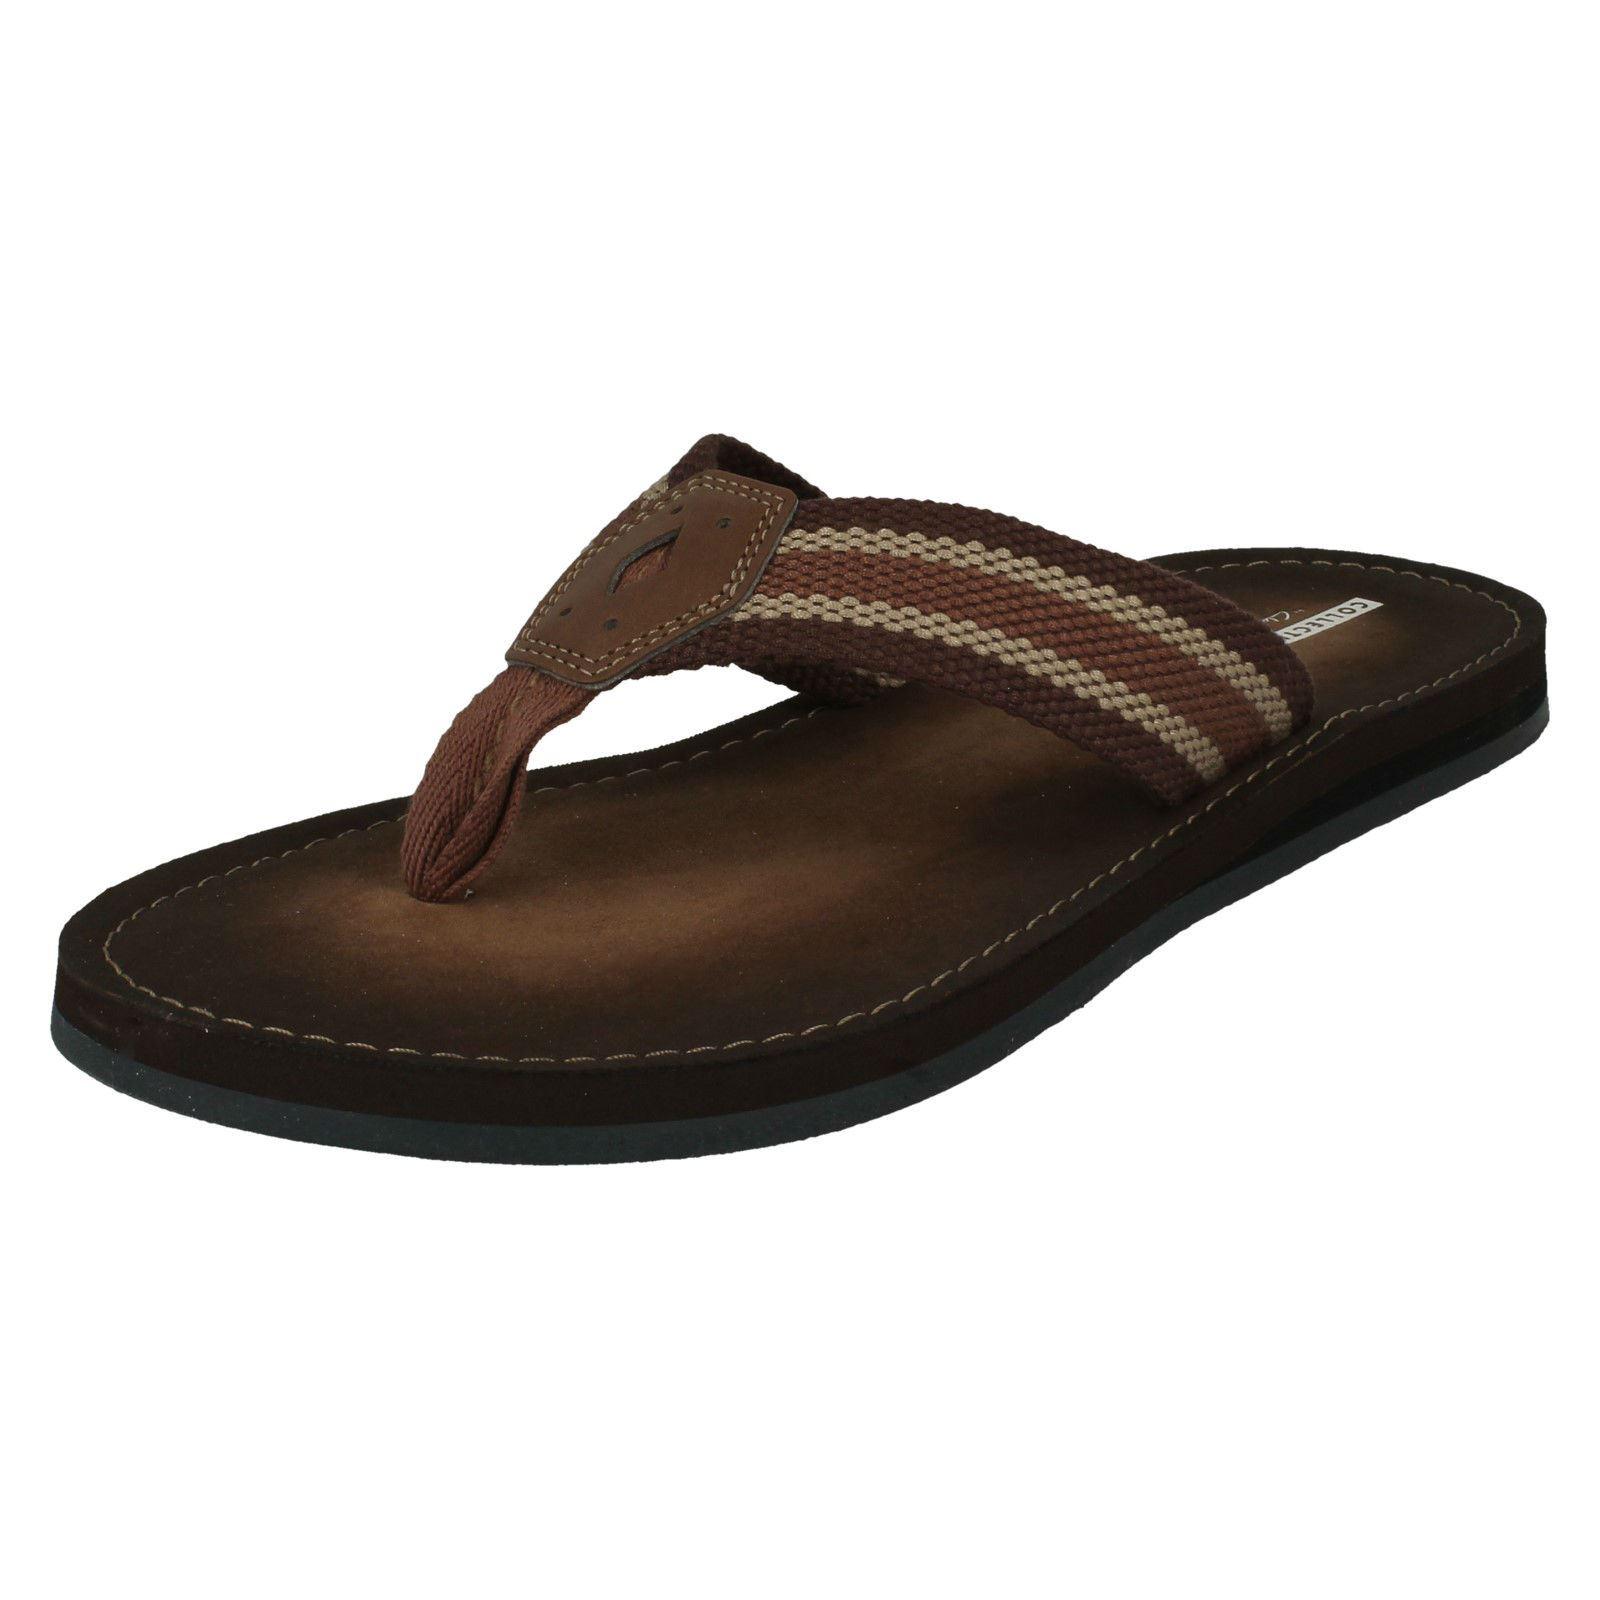 Clarks hombres para casual sobre Sandals Sun hombre Everday textil Lacono para Brown Summer Deslizamiento Calzado wgXtqw